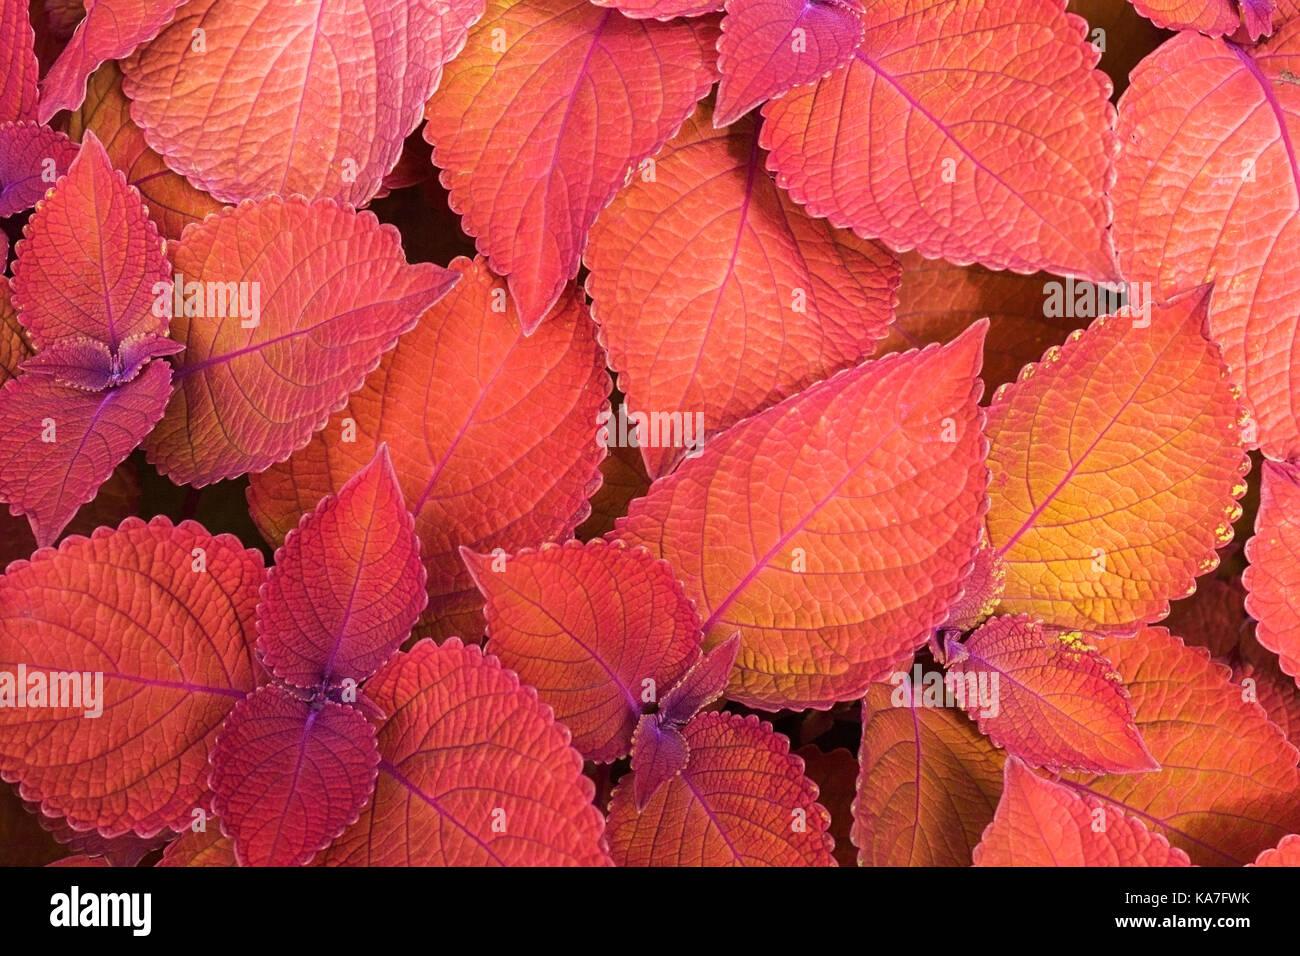 Coleus nettle (Solenostemon scutellarioides), Campfire leaves in summer, Montreal, Quebec, Canada Stock Photo